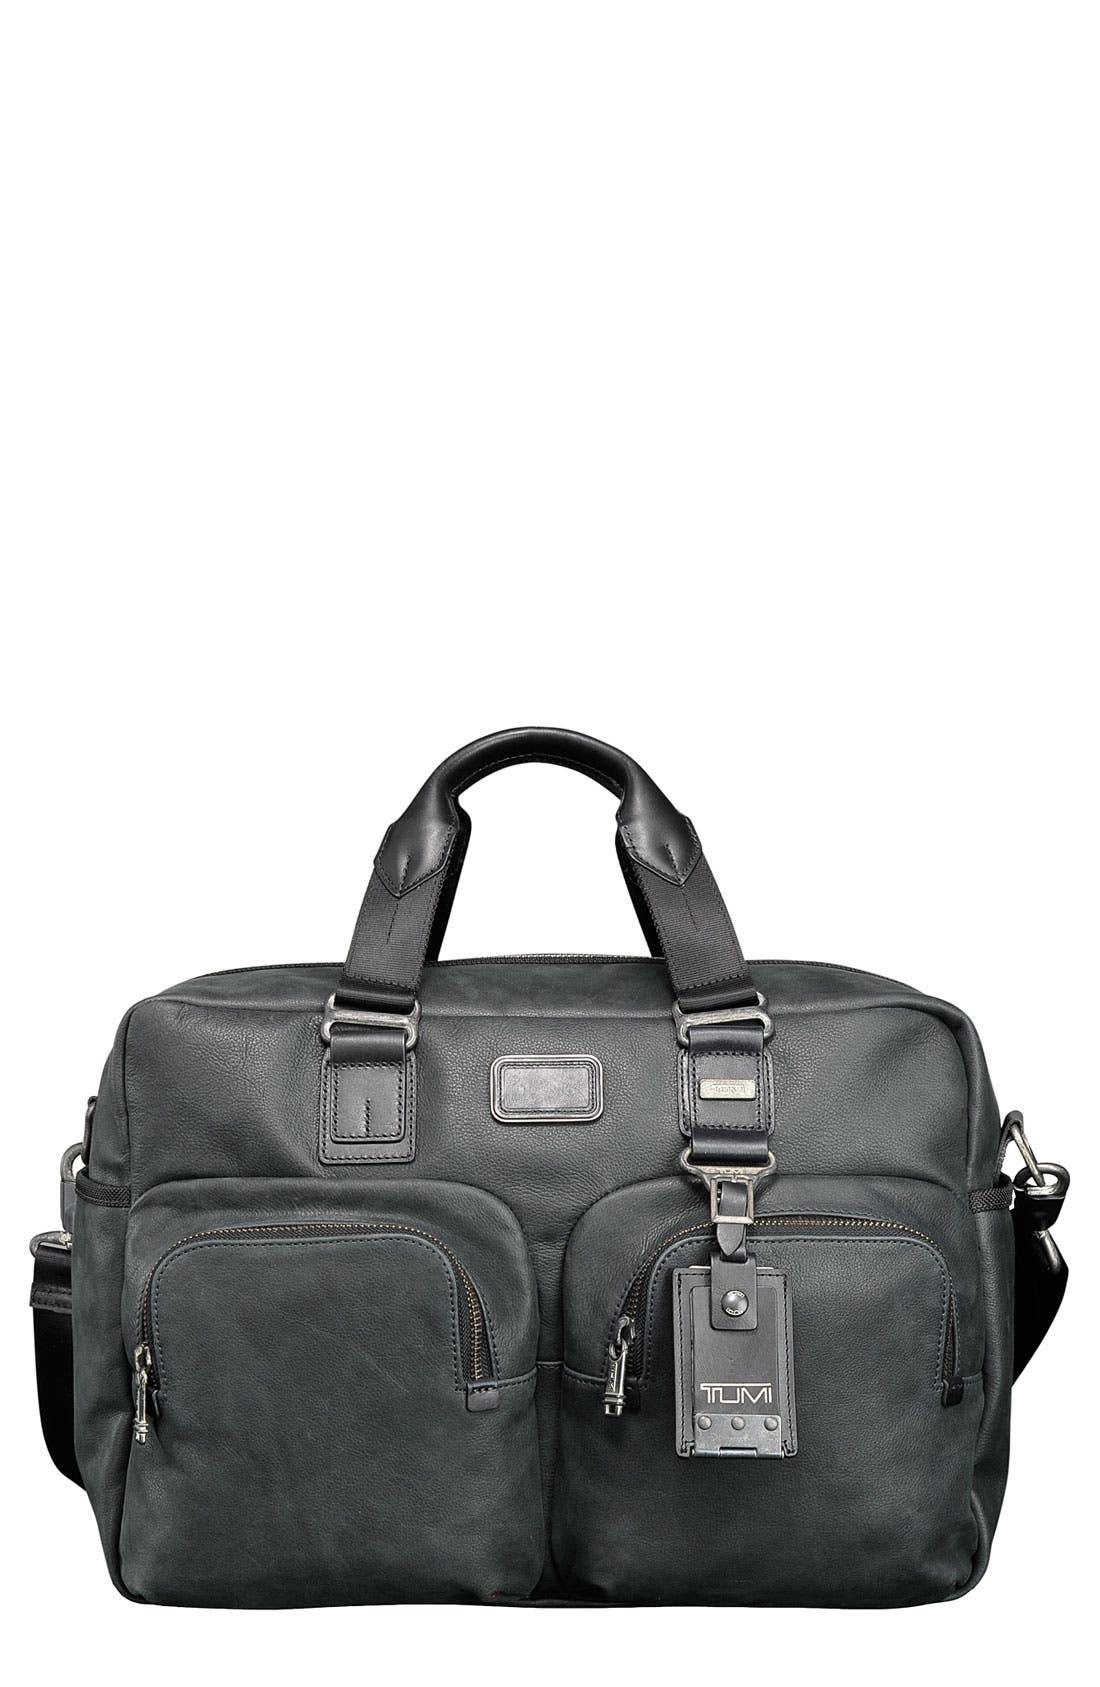 Alternate Image 1 Selected - Tumi 'Alpha Bravo - Everett' Essential Leather Tote